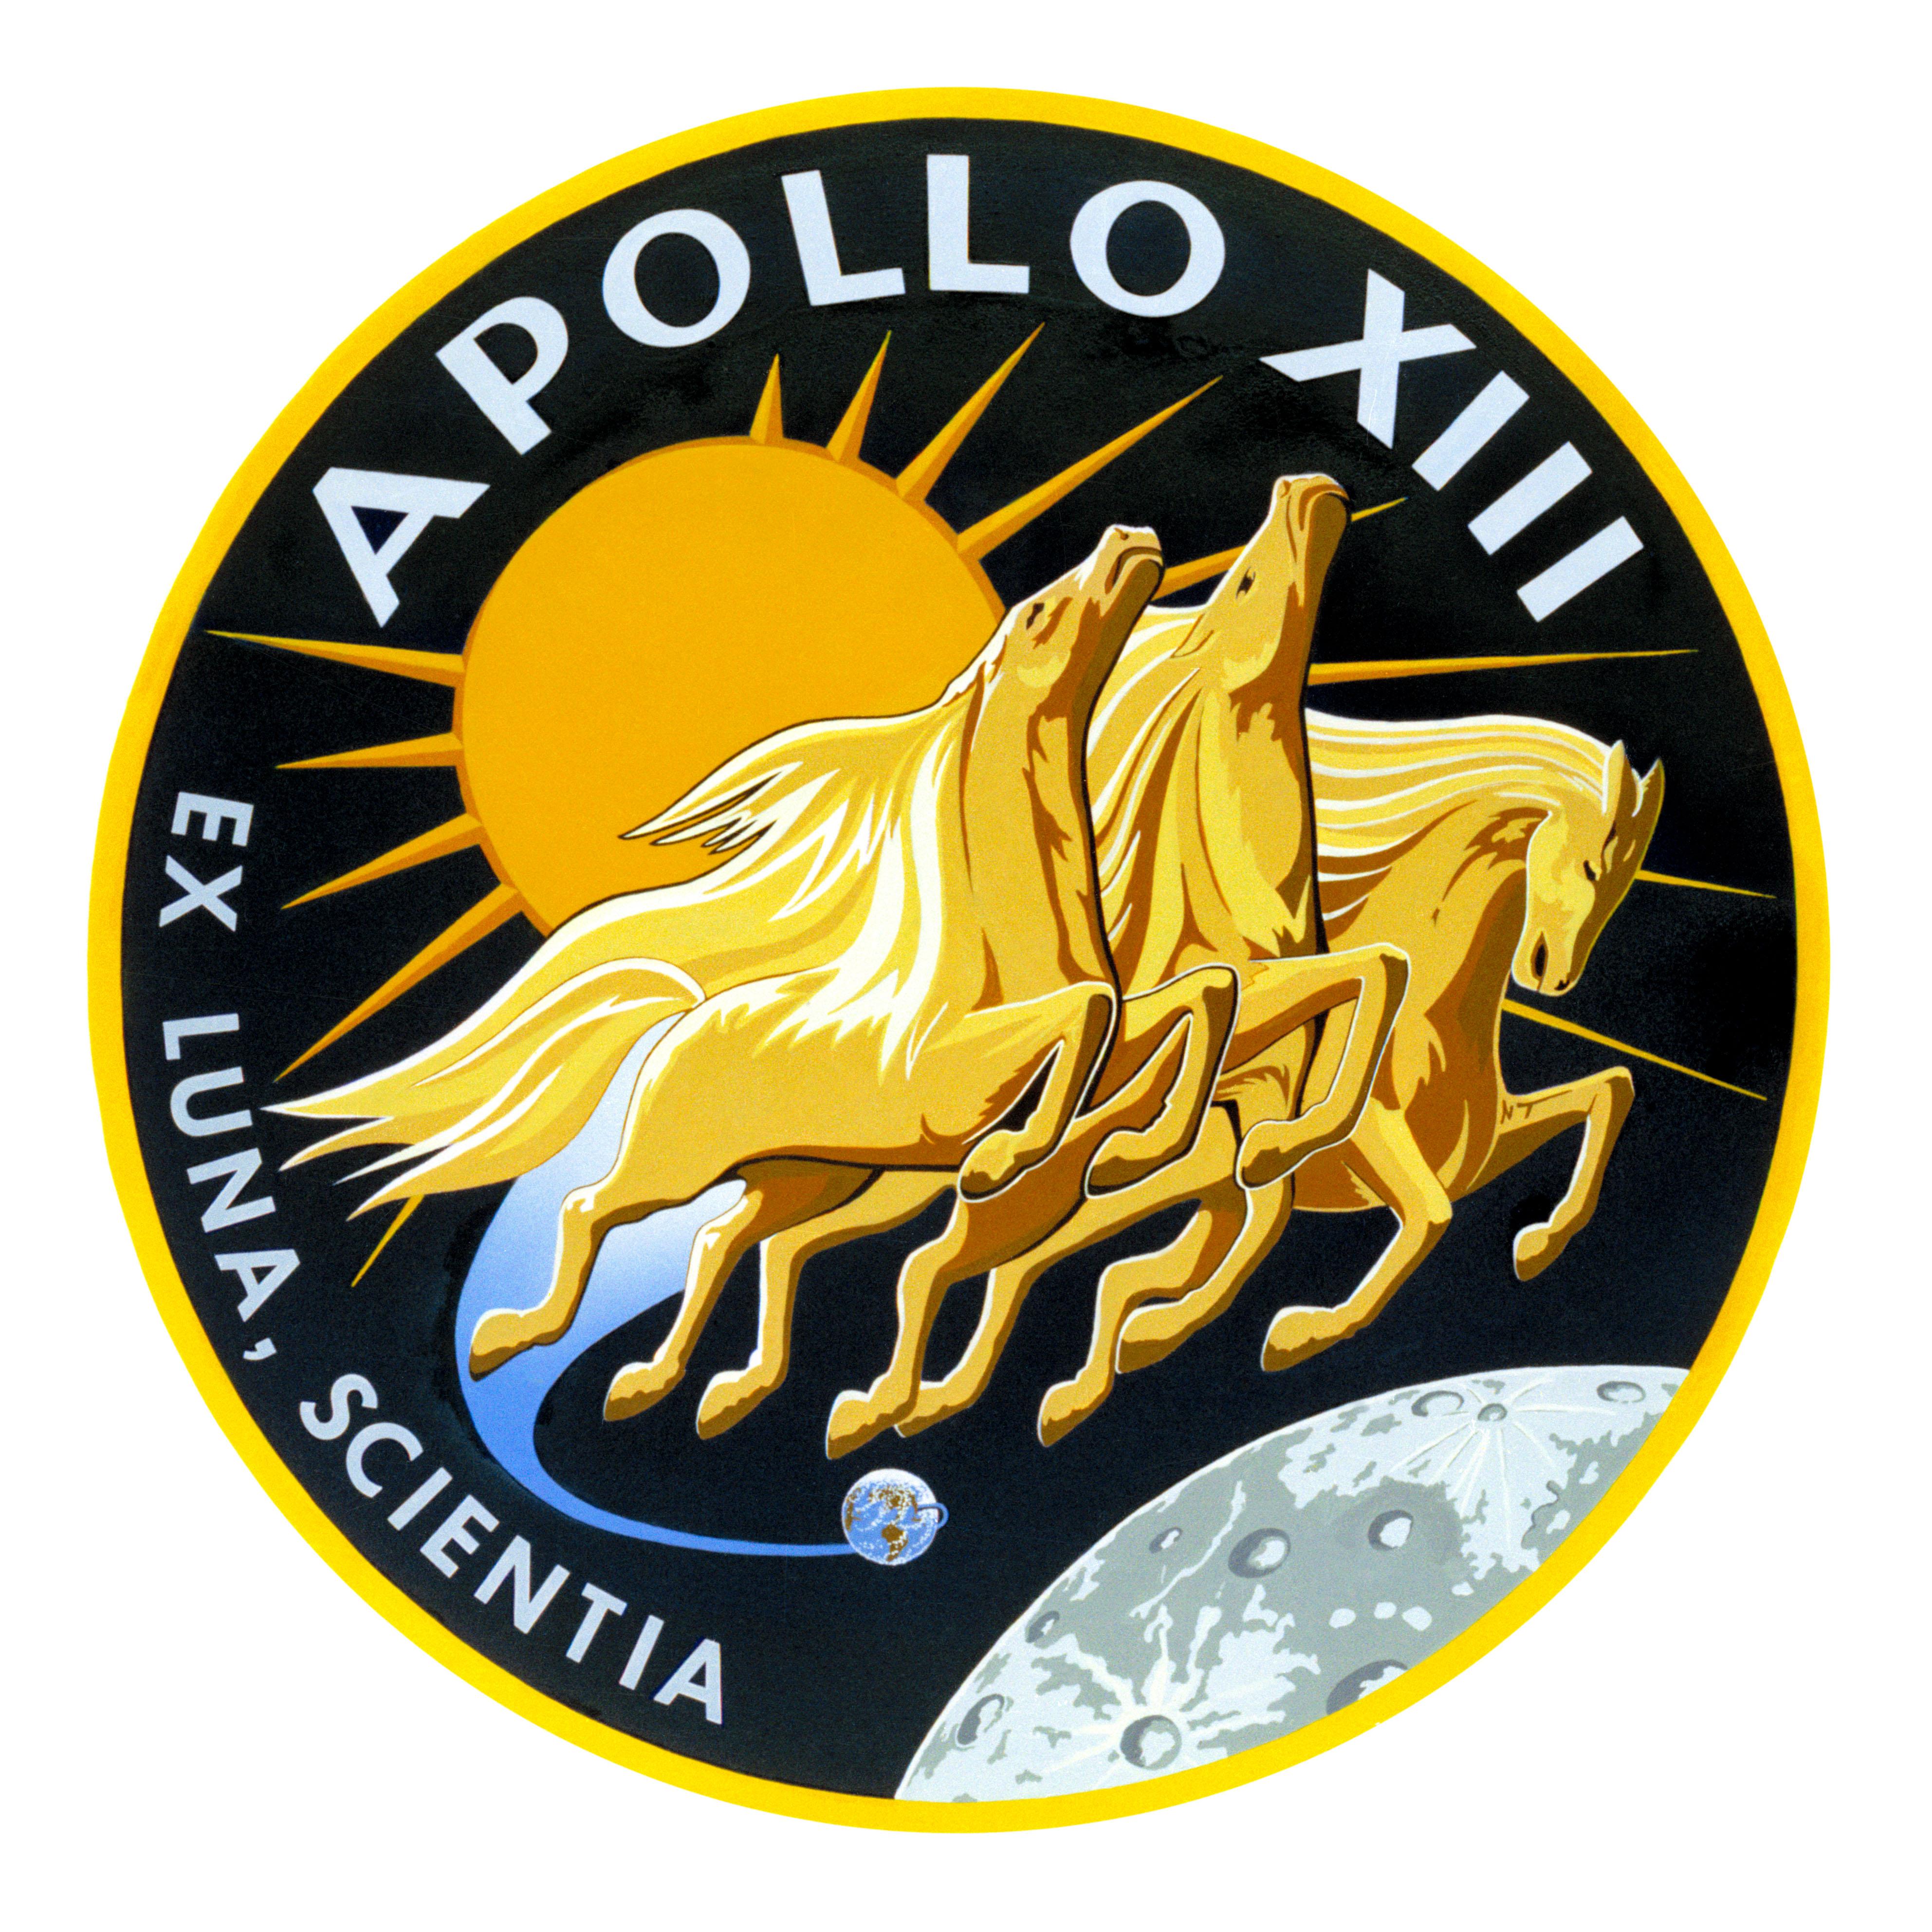 Apollo 13 emblem nasa image and video library biocorpaavc